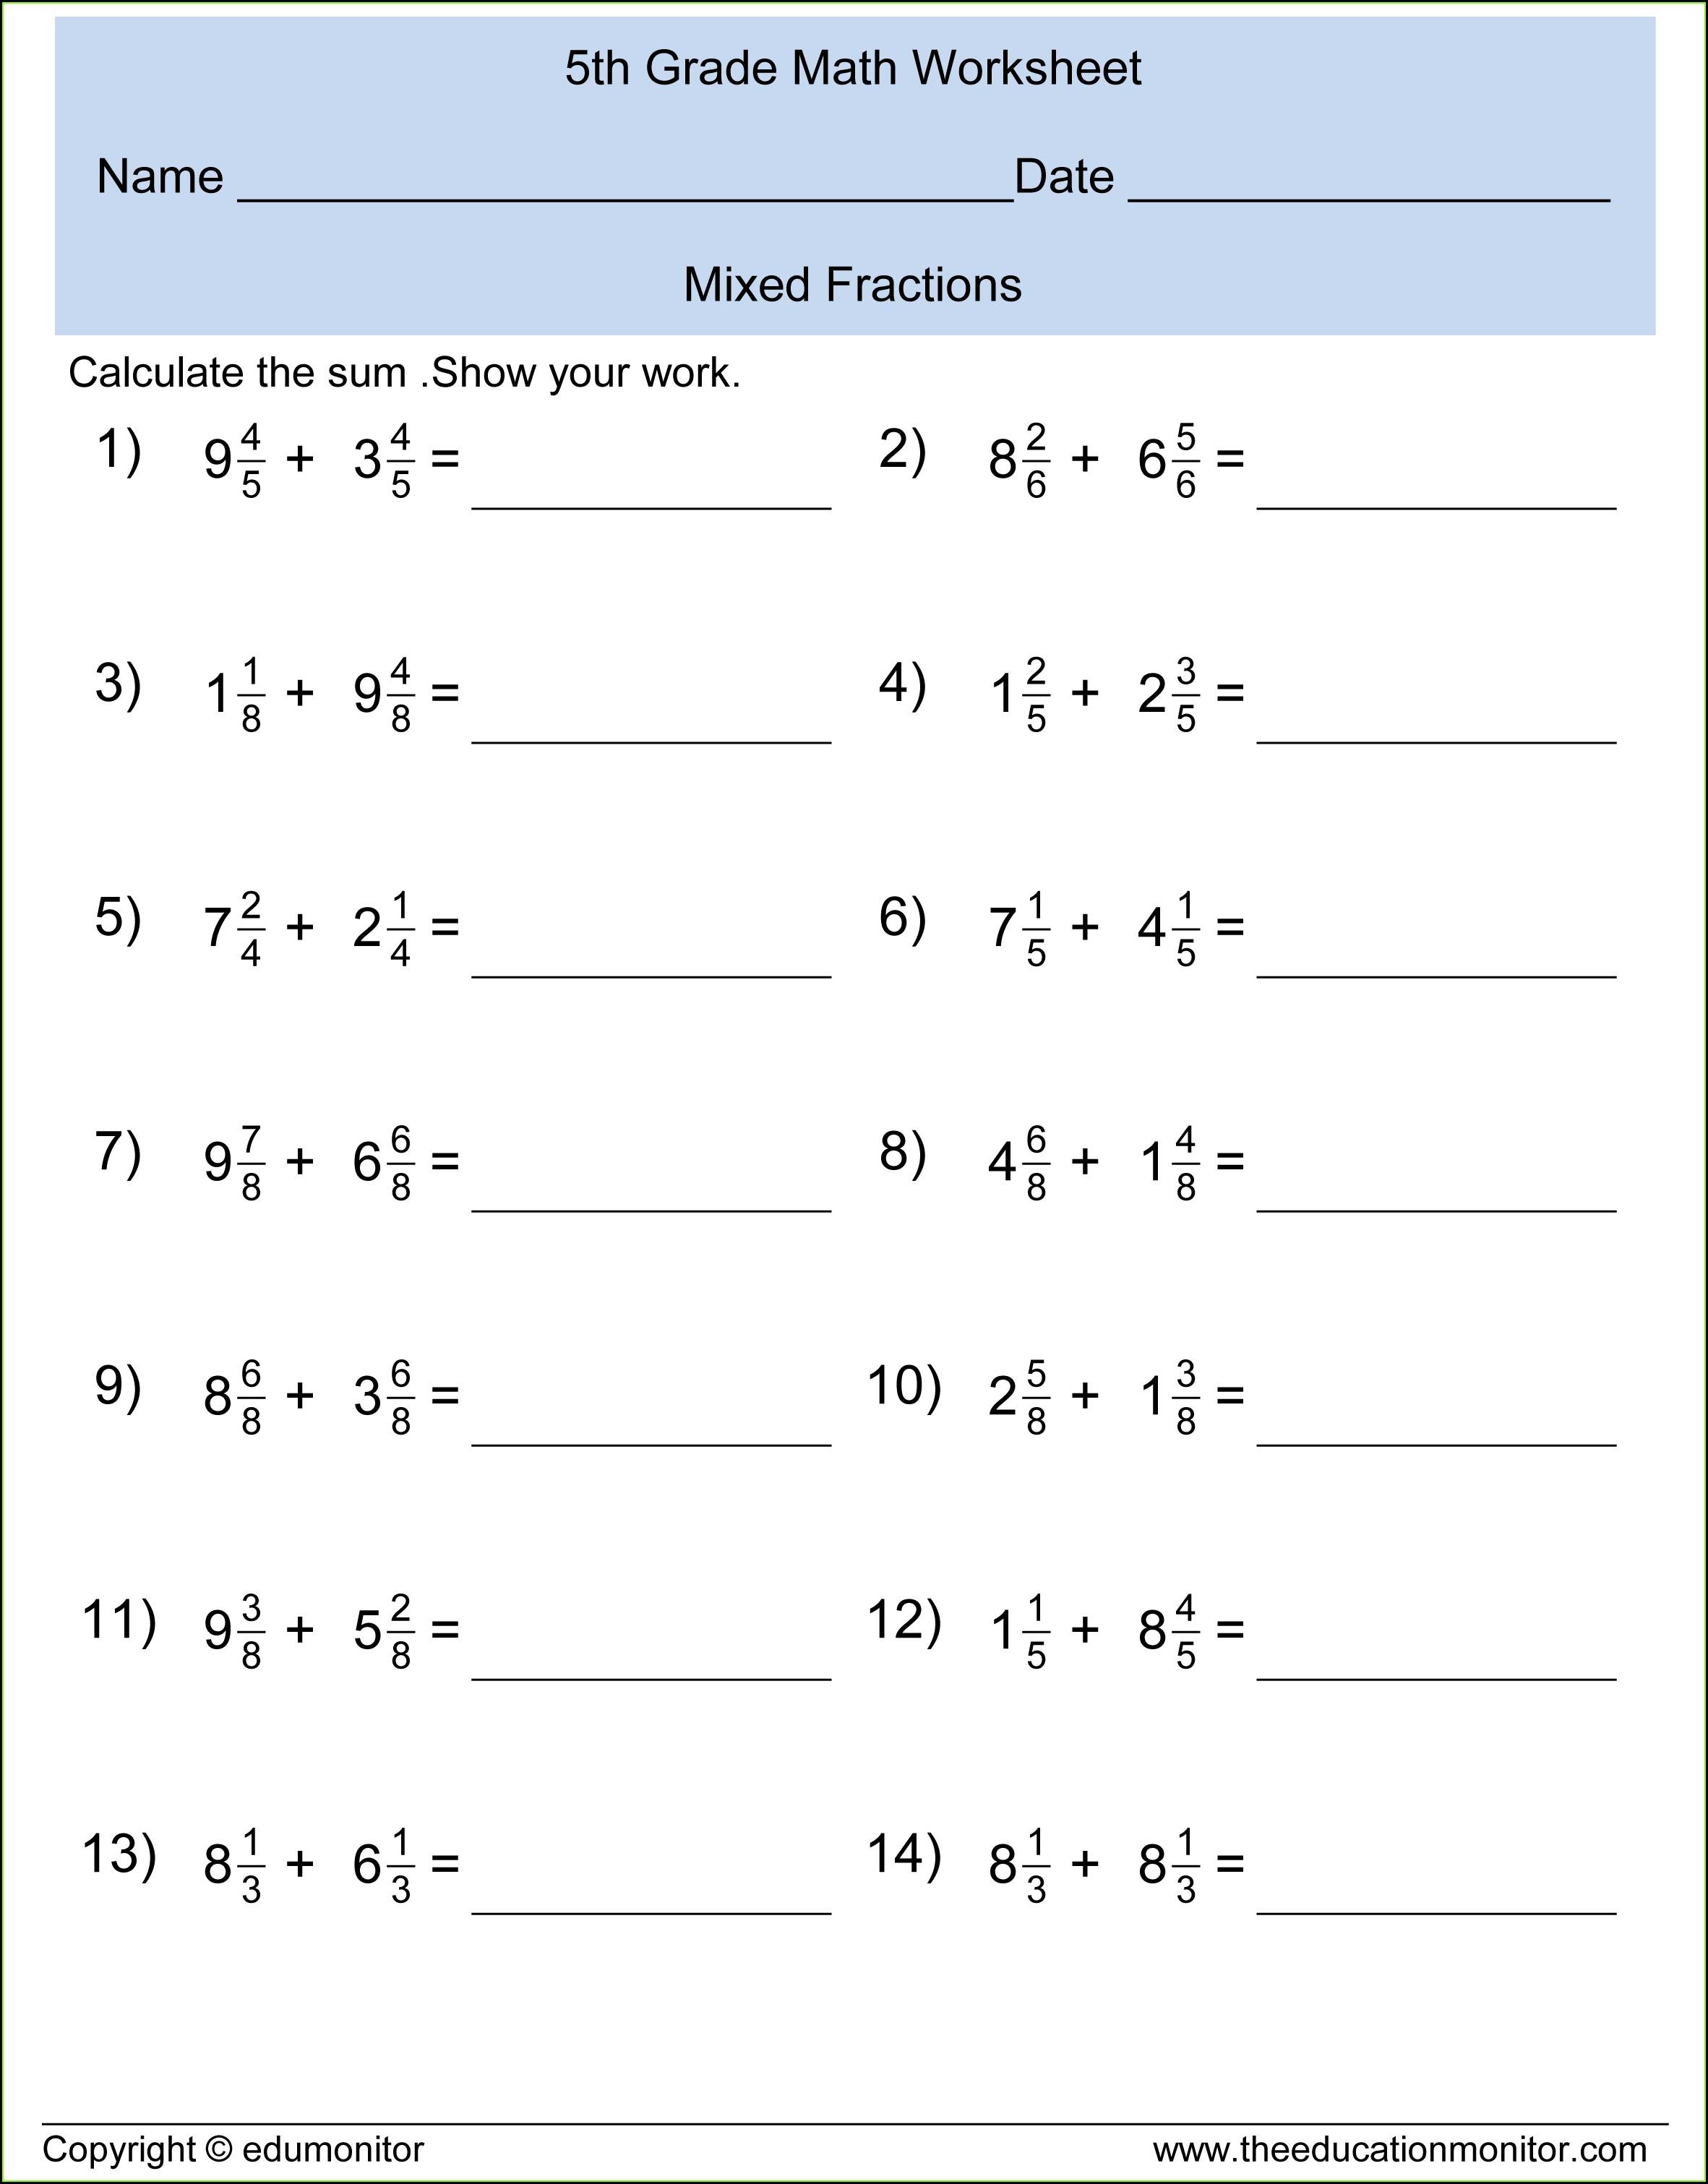 5th Grade Math Worksheet Fractions